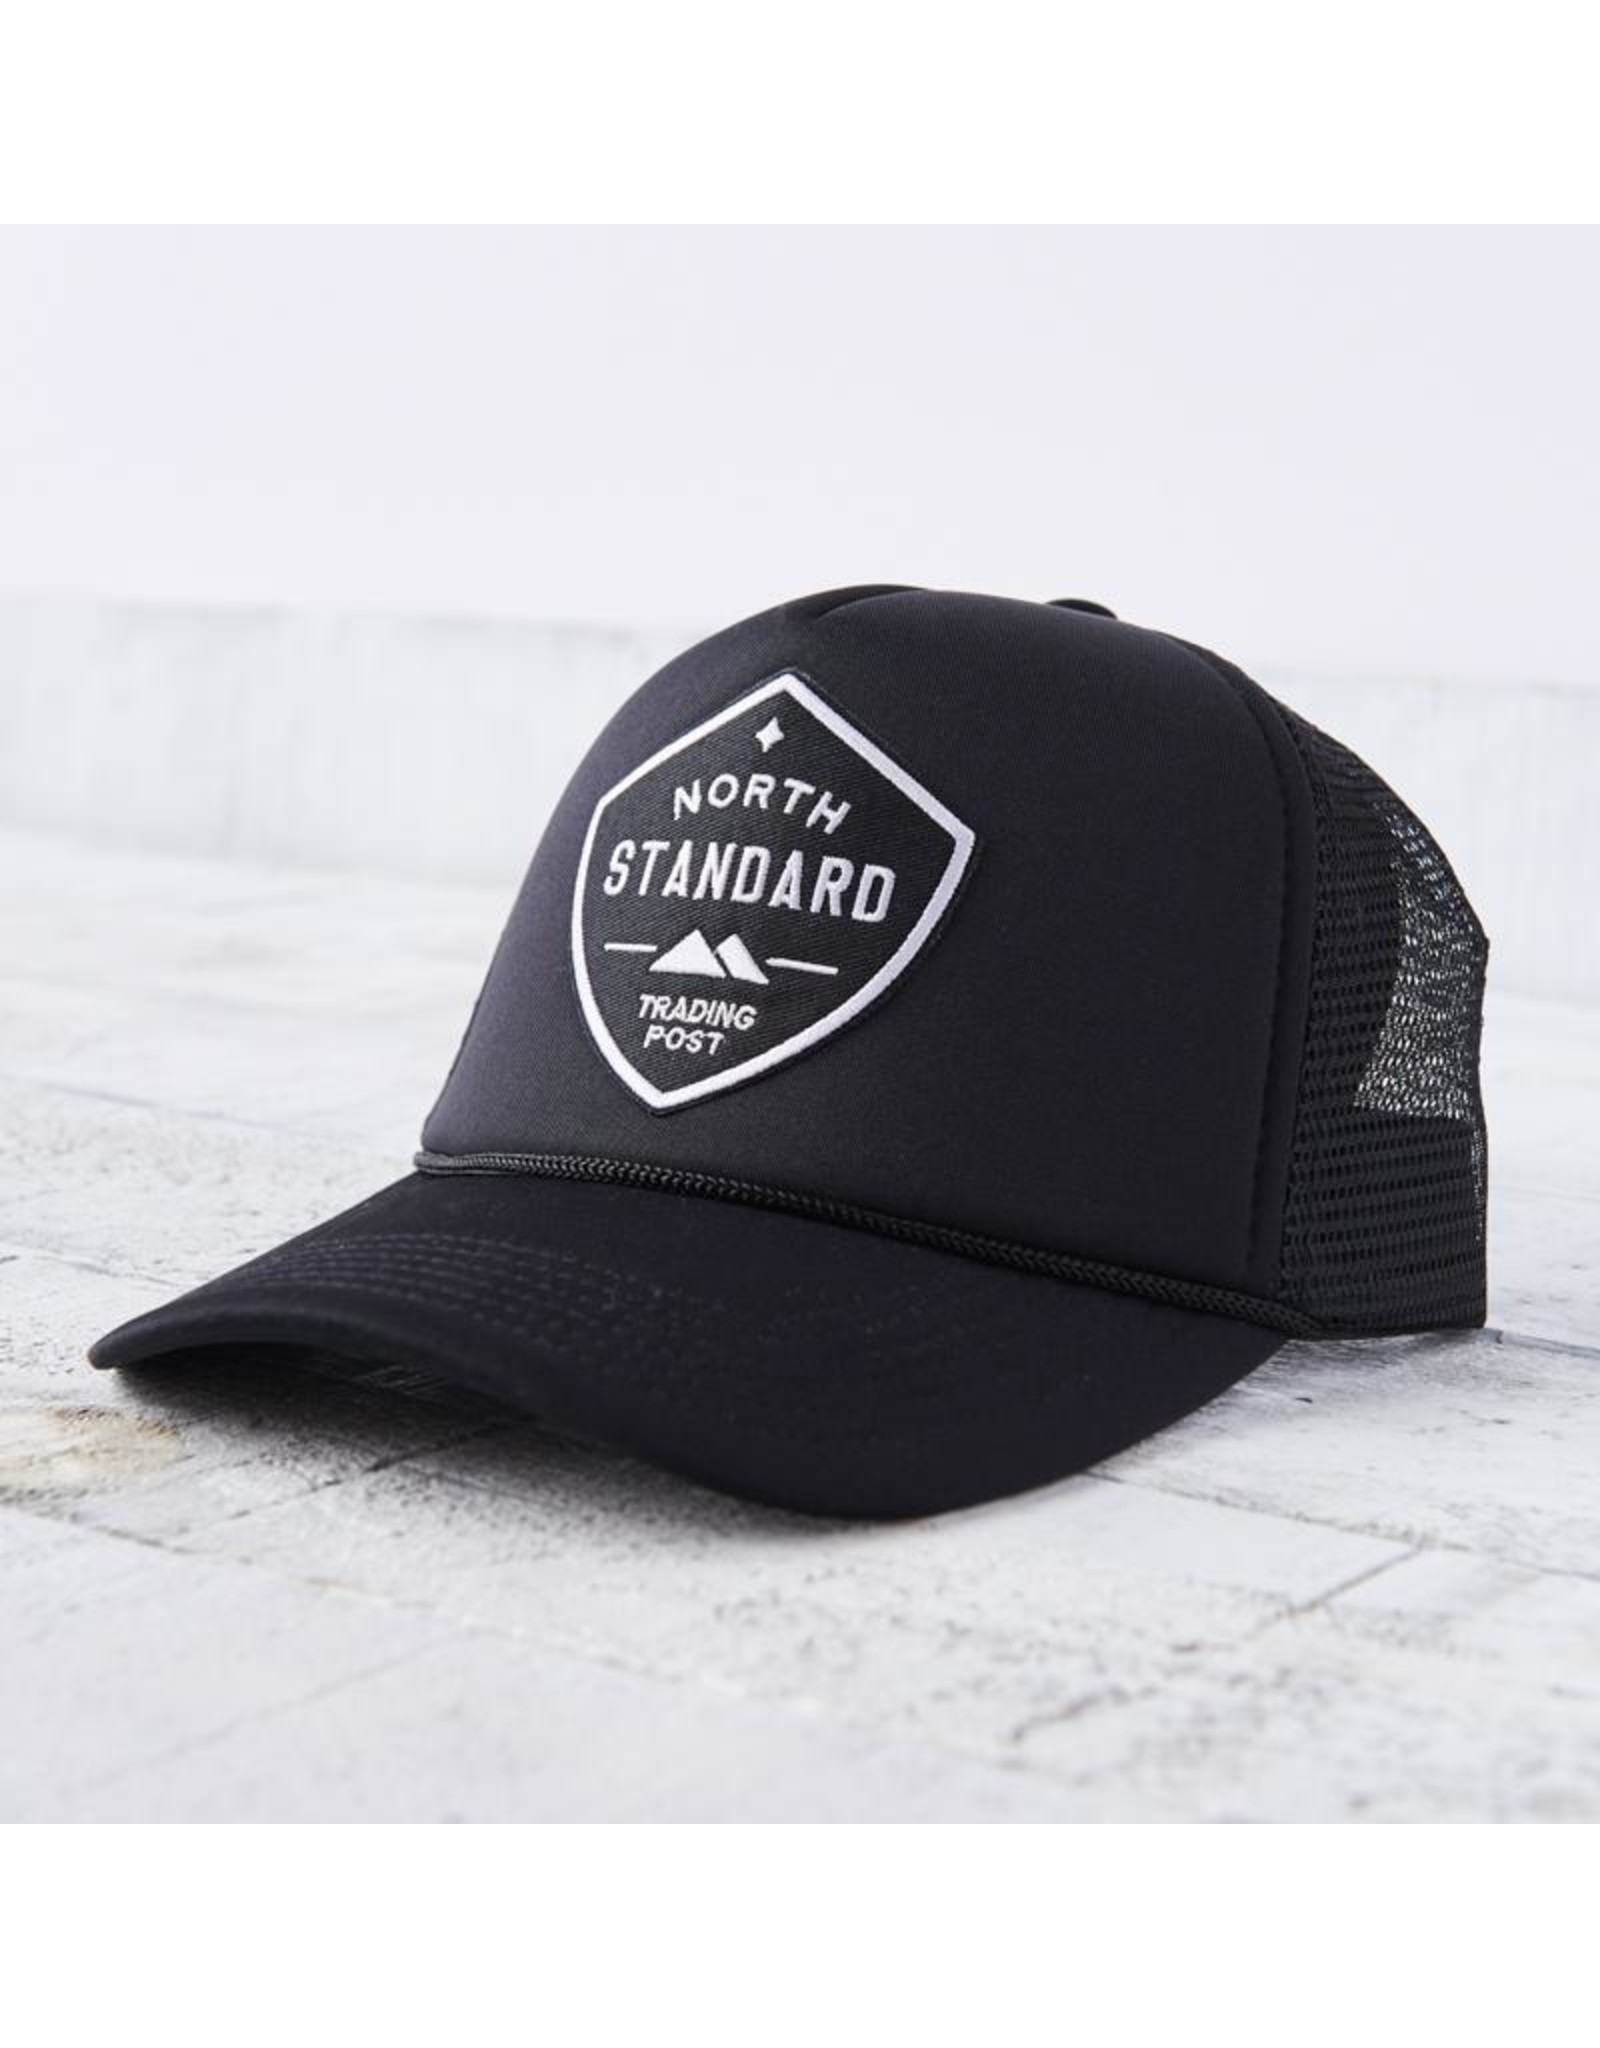 North Standard North Standard - Mesh Trucker Hat Blk/Wh Shield